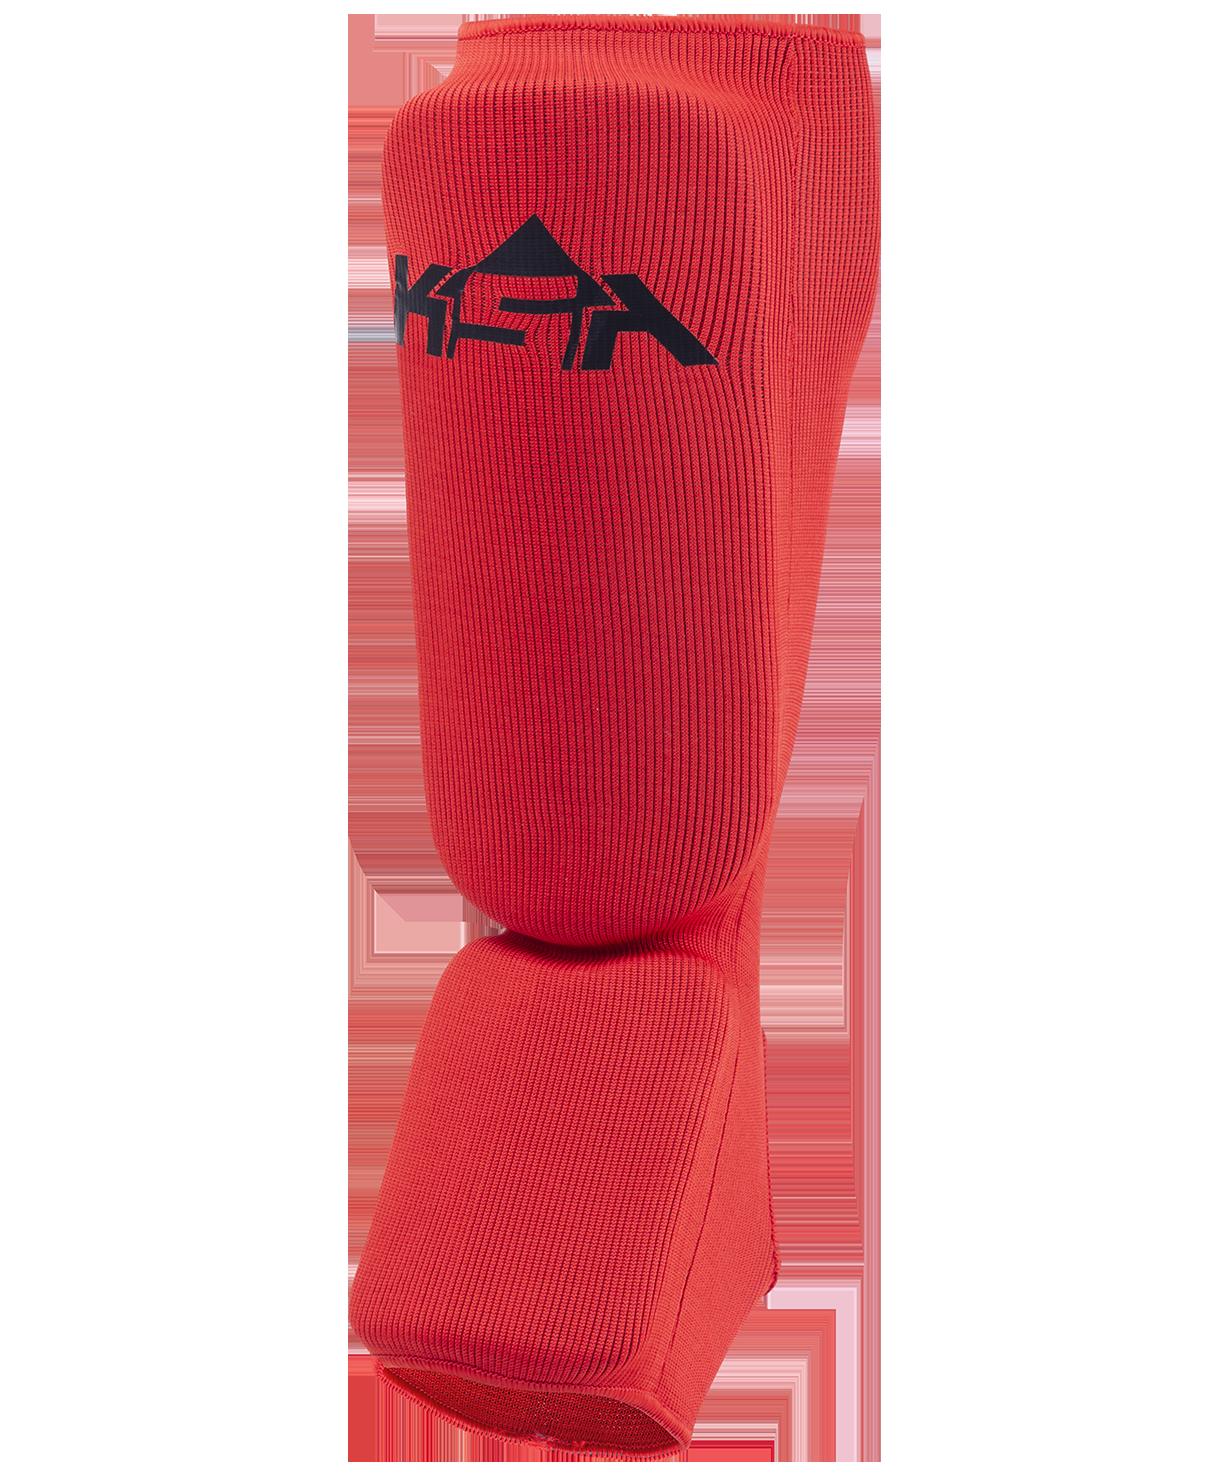 Другая защита Защита голень-стопа KSA красная 8356c00fdfd92fac3c2b4a2f744a7d5d.png